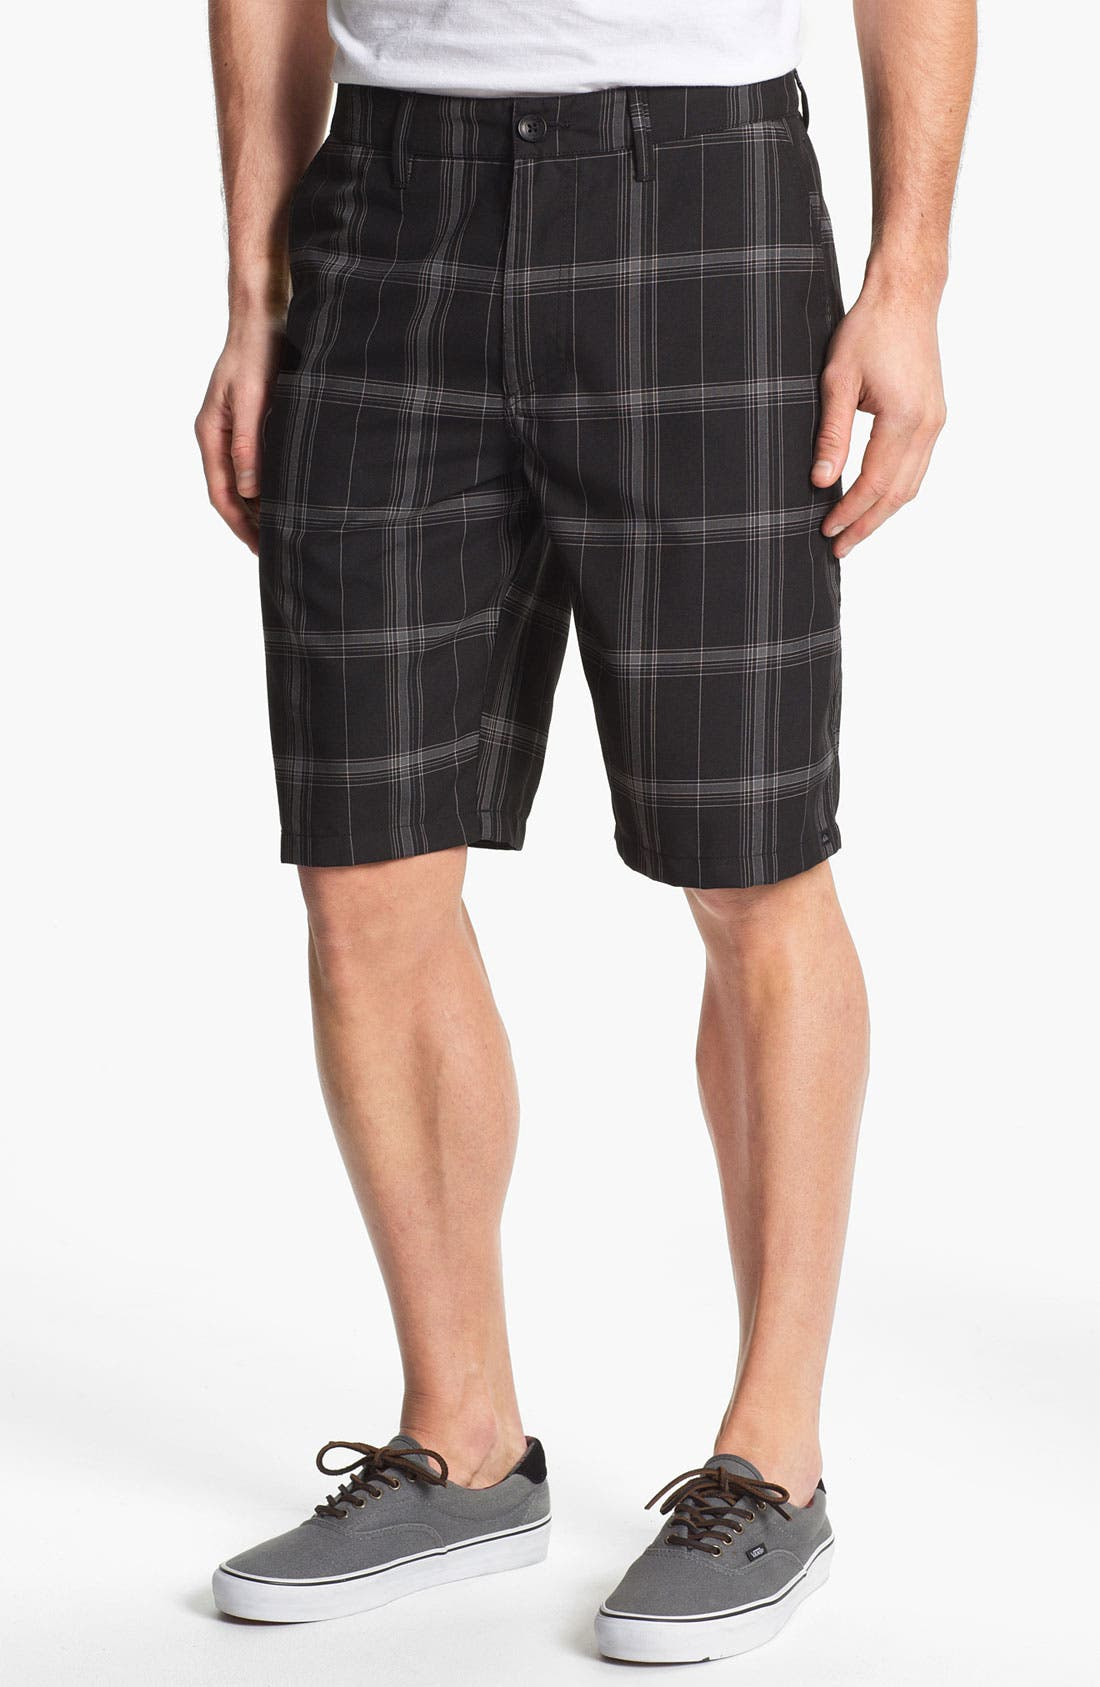 Alternate Image 1 Selected - Quiksilver 'Regency' Shorts